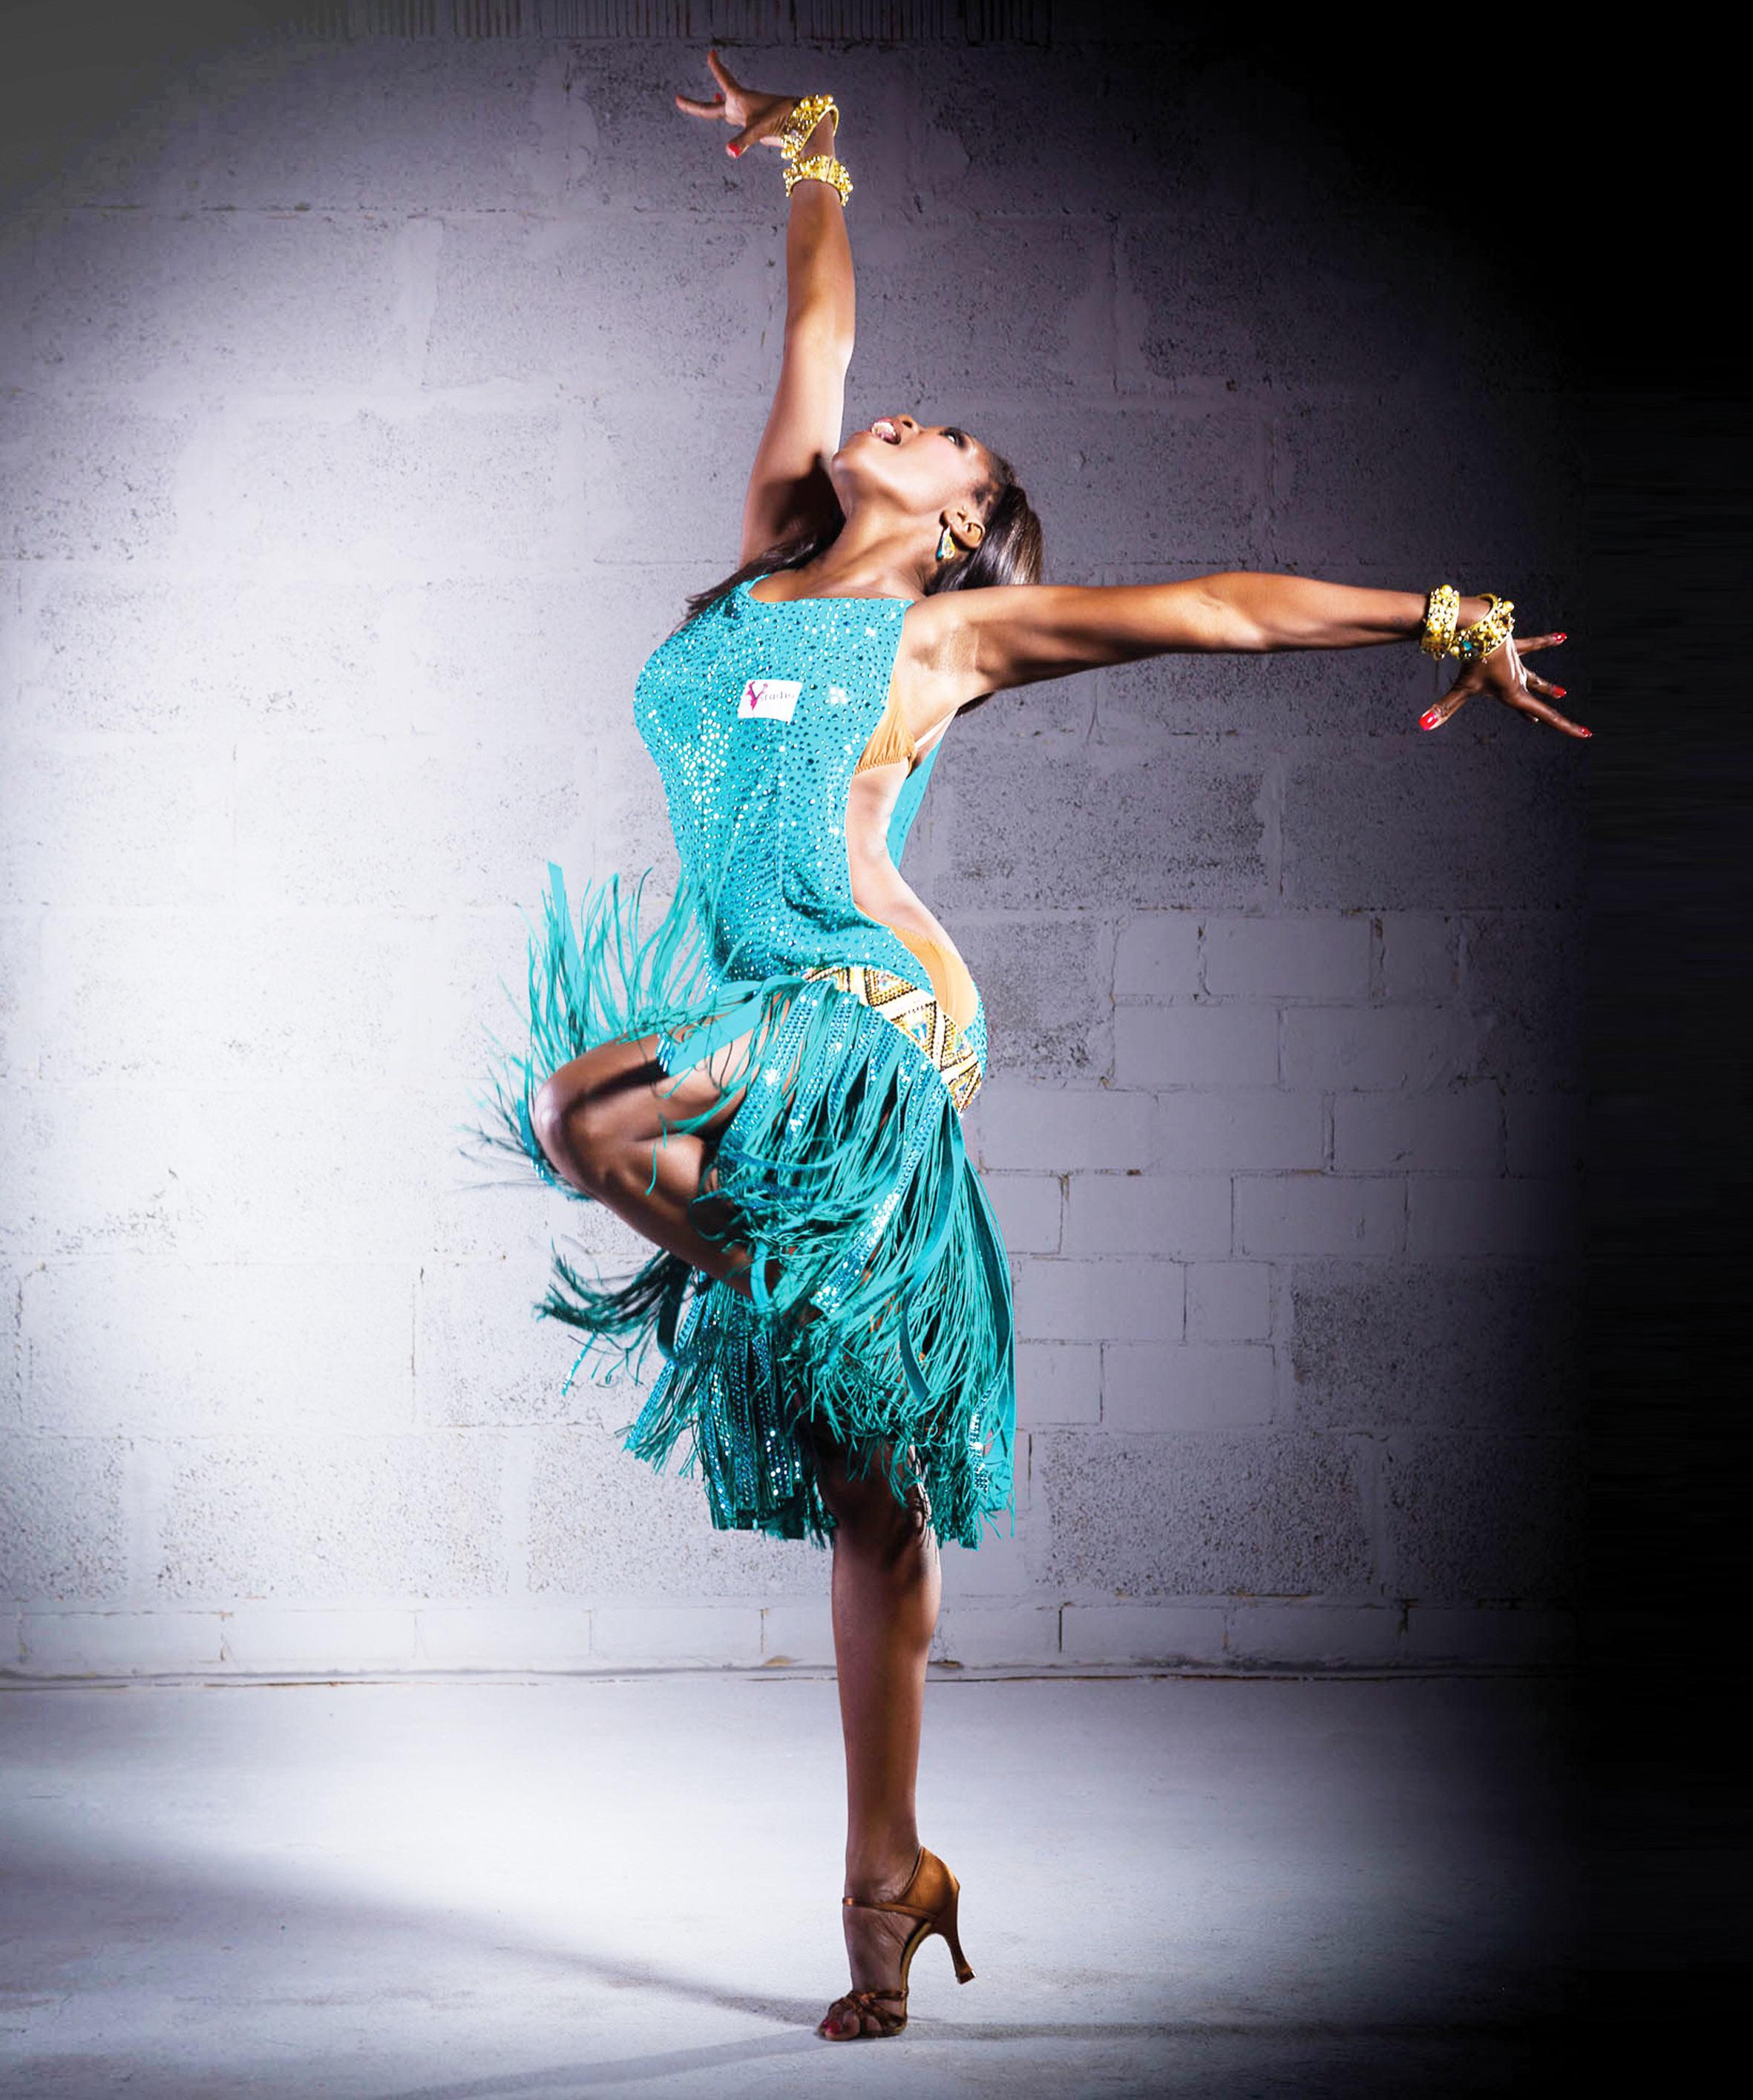 Dress by V-STUDIO dance fashion